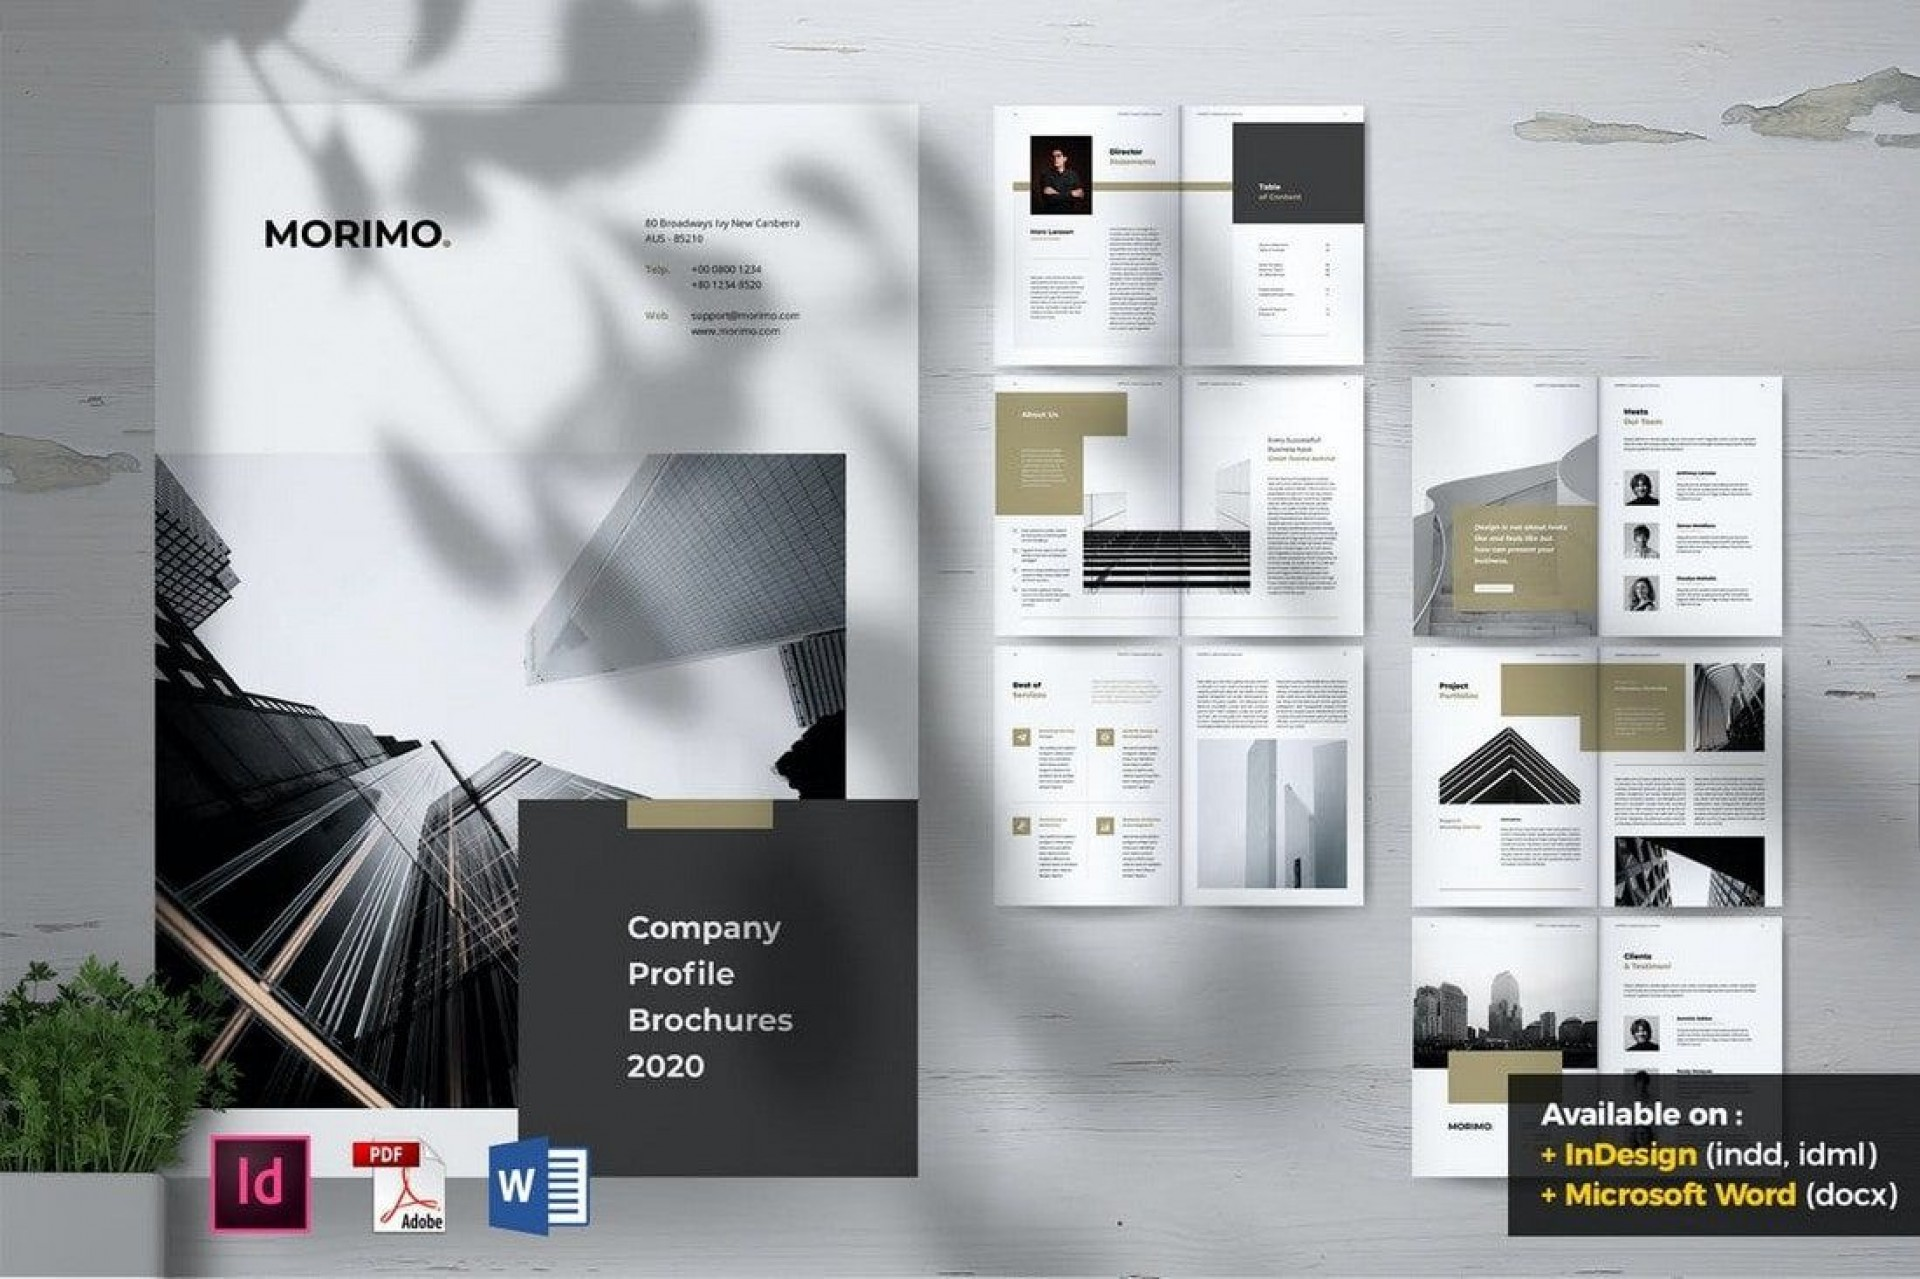 008 Unforgettable Template Brochure For Microsoft Word Free Idea  Flyer Bowling Tri Fold 20101920